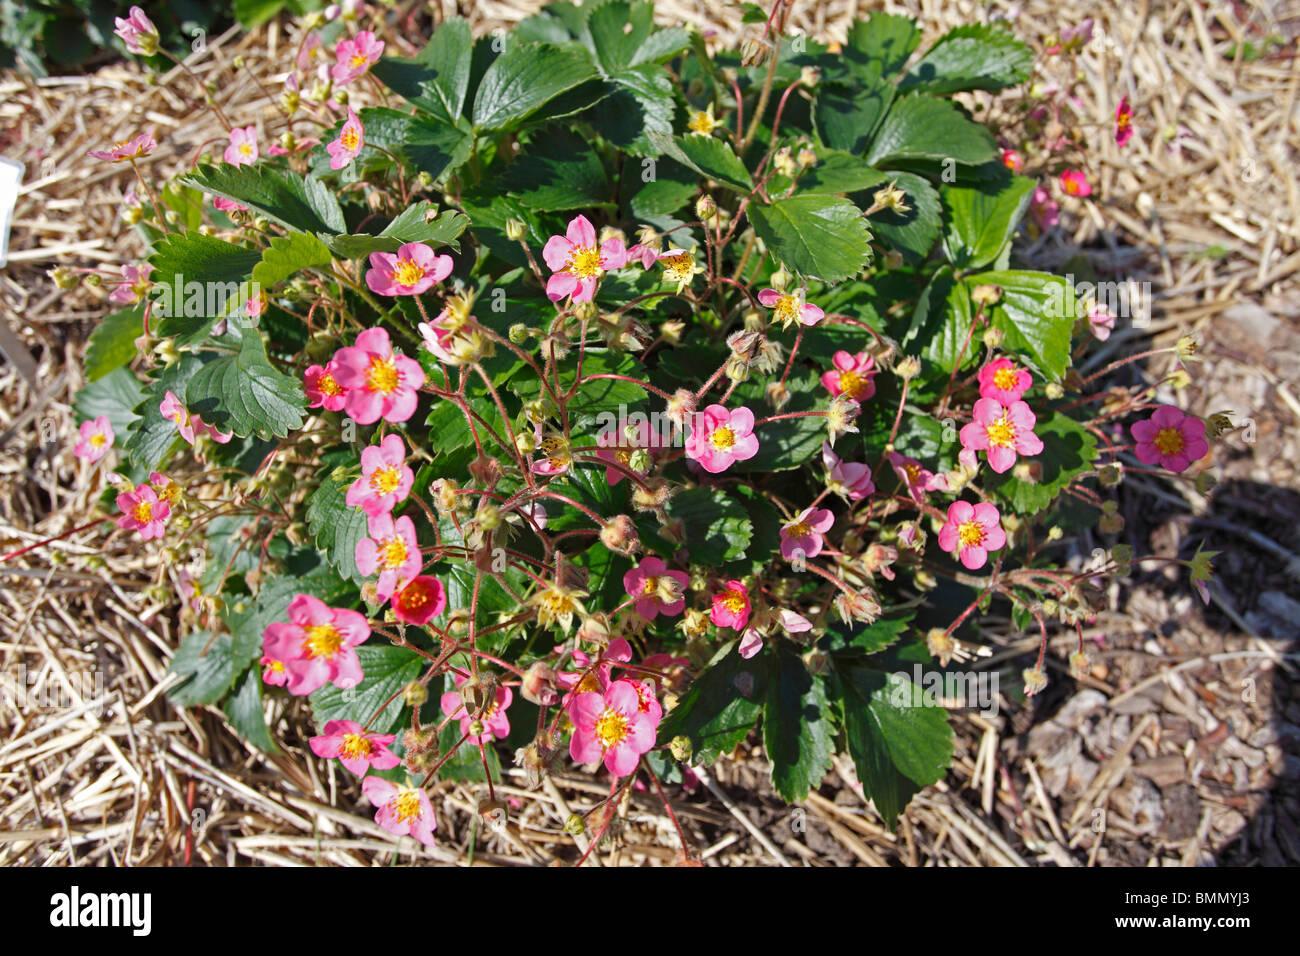 Strawberry fragaria pink panda plant in flower stock photo strawberry fragaria pink panda plant in flower mightylinksfo Gallery